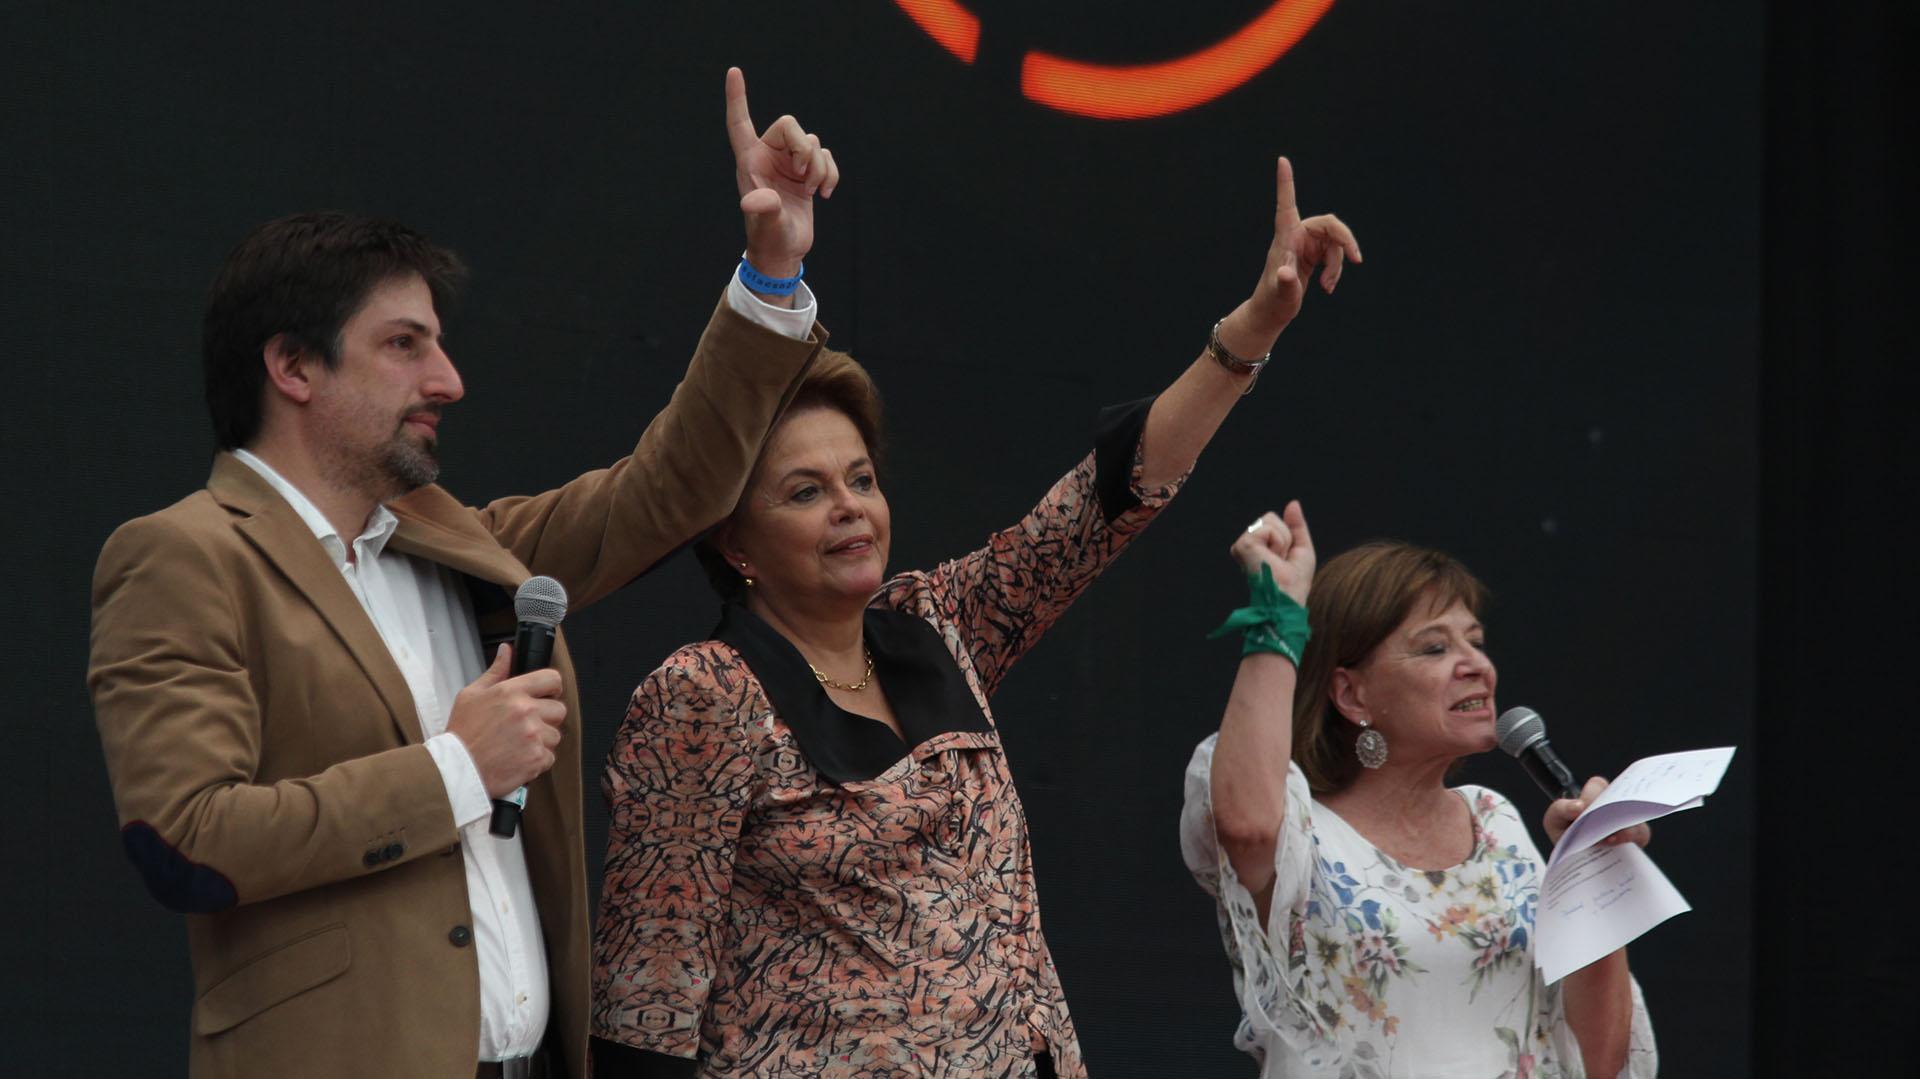 Nicolás Trotta, rector de la UMET, y la ex presidente de Brasil Dilma Rousseff